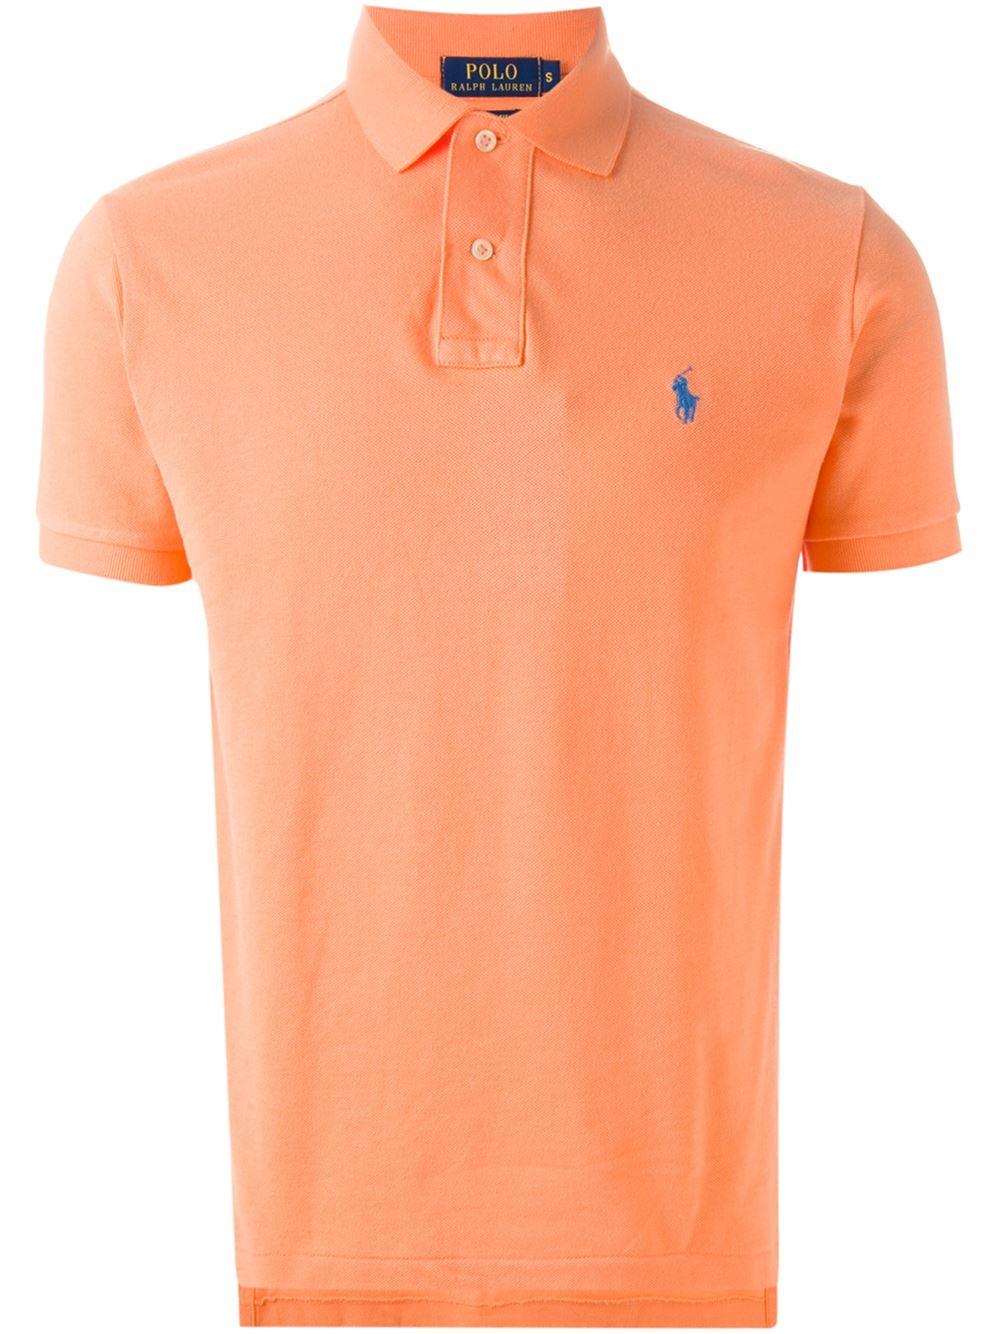 Polo ralph lauren classic polo shirt in orange for men for Orange polo shirt mens